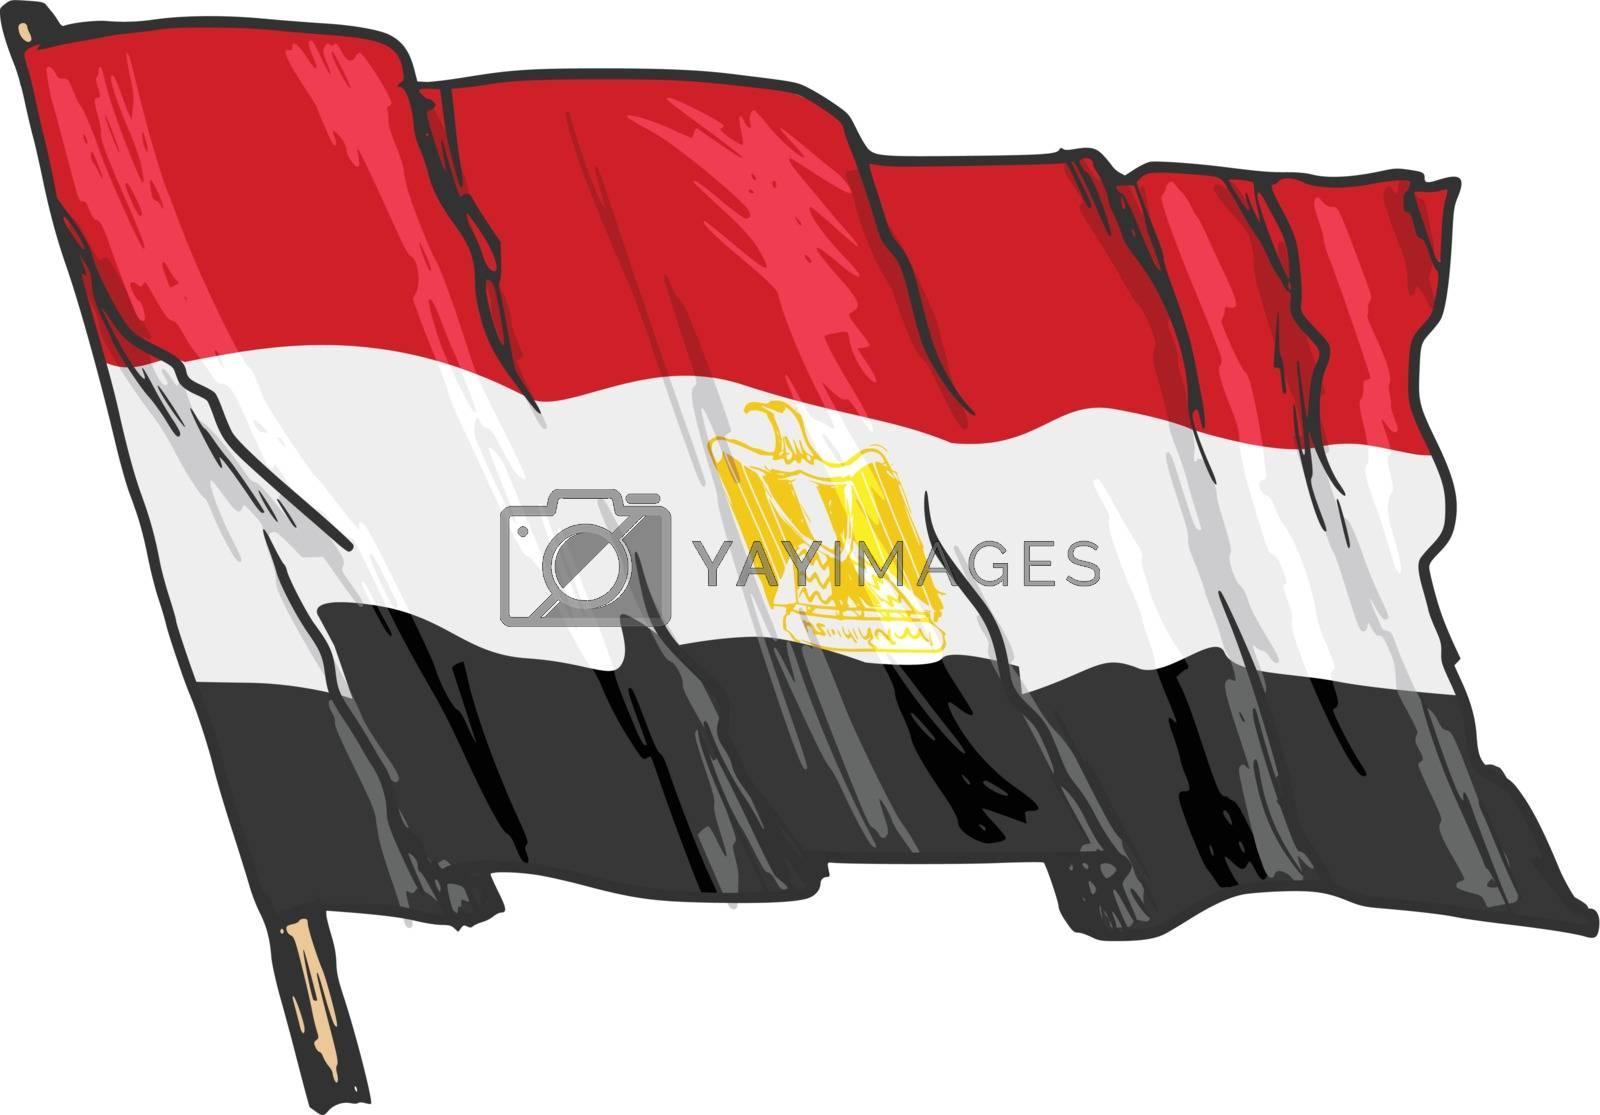 hand drawn, sketch, illustration of flag of Egypt